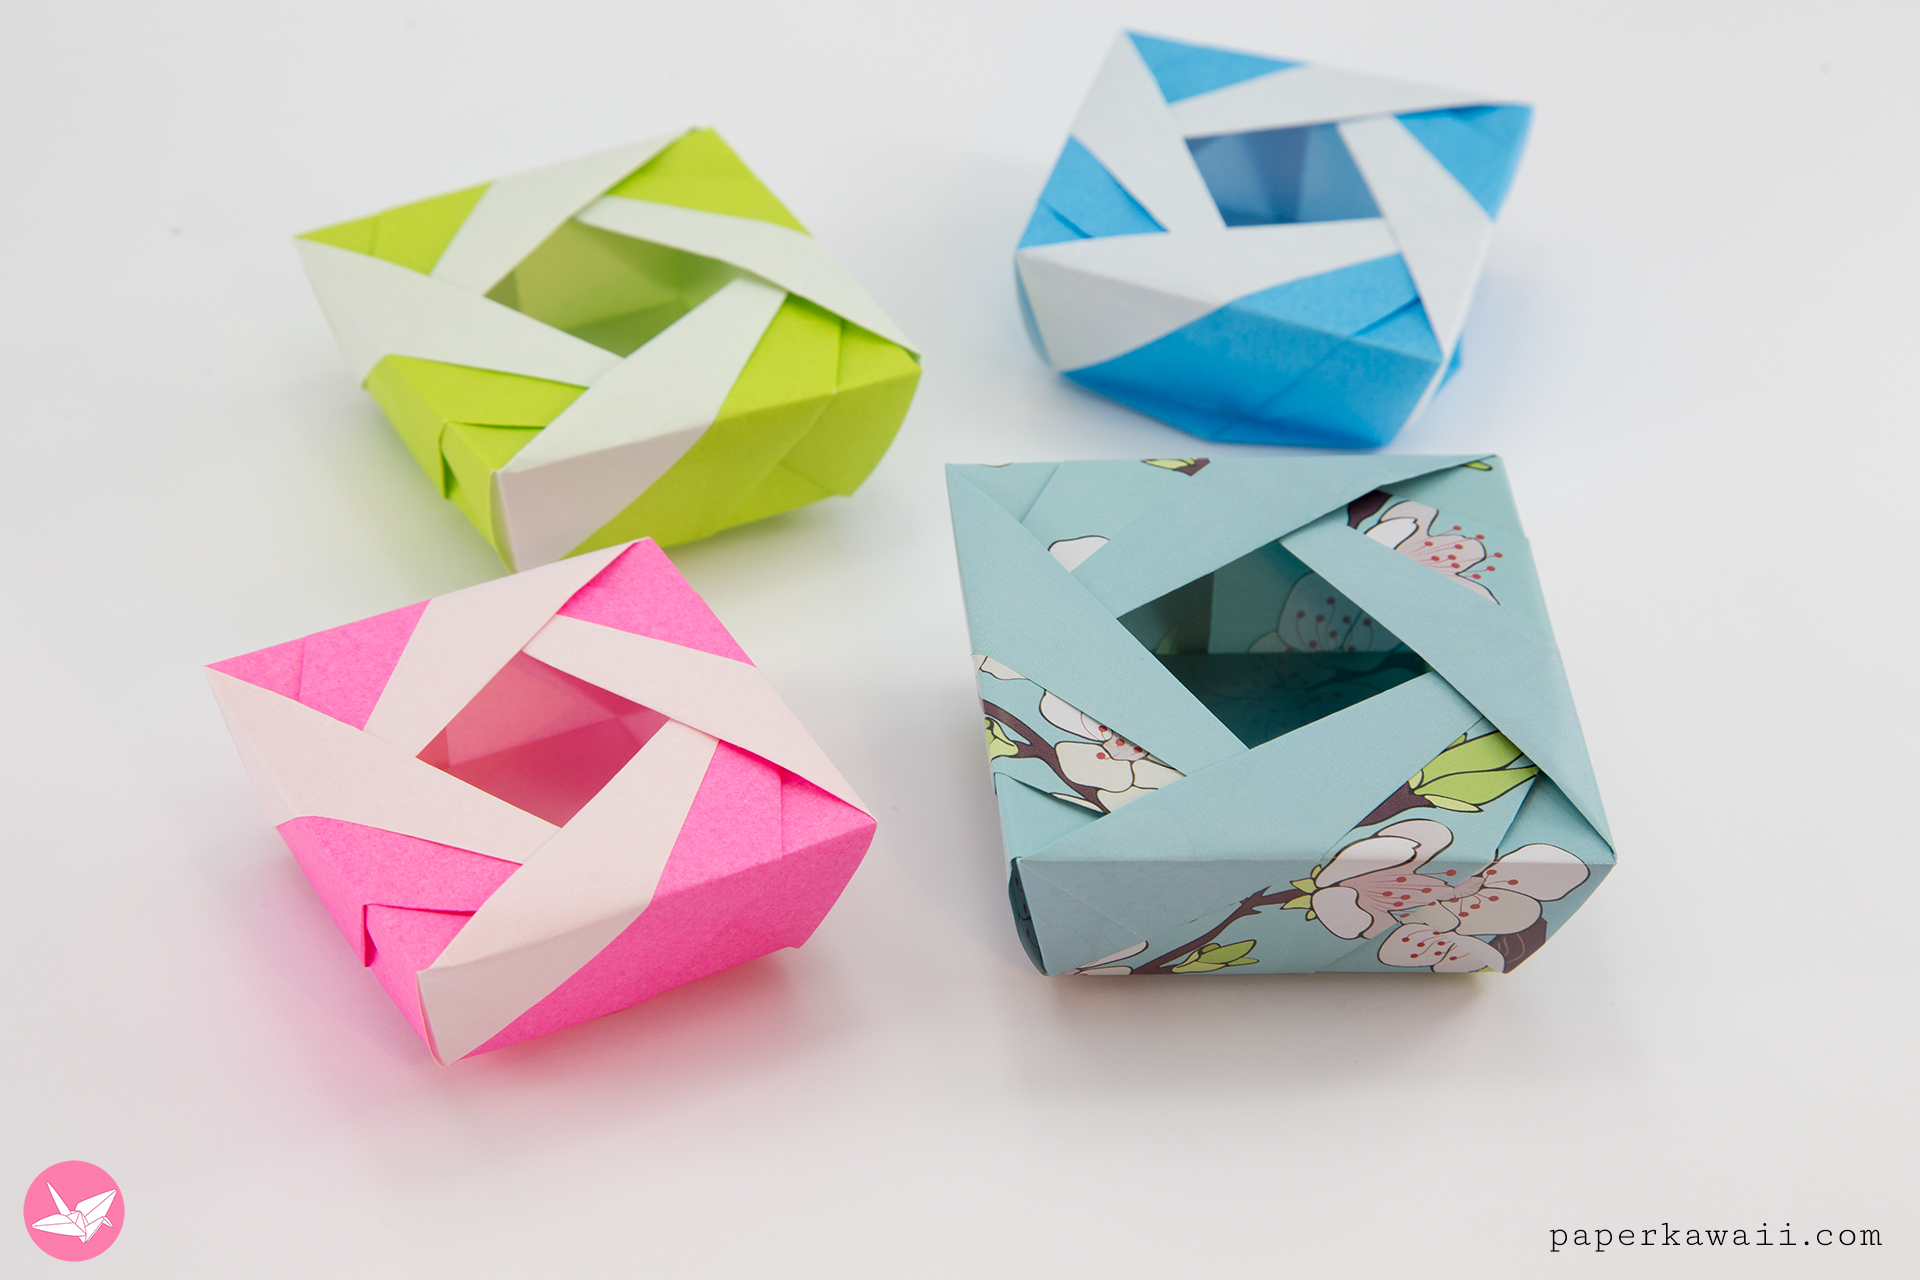 Origami Lady Box Tutorial (José Meeusen) via @paper_kawaii